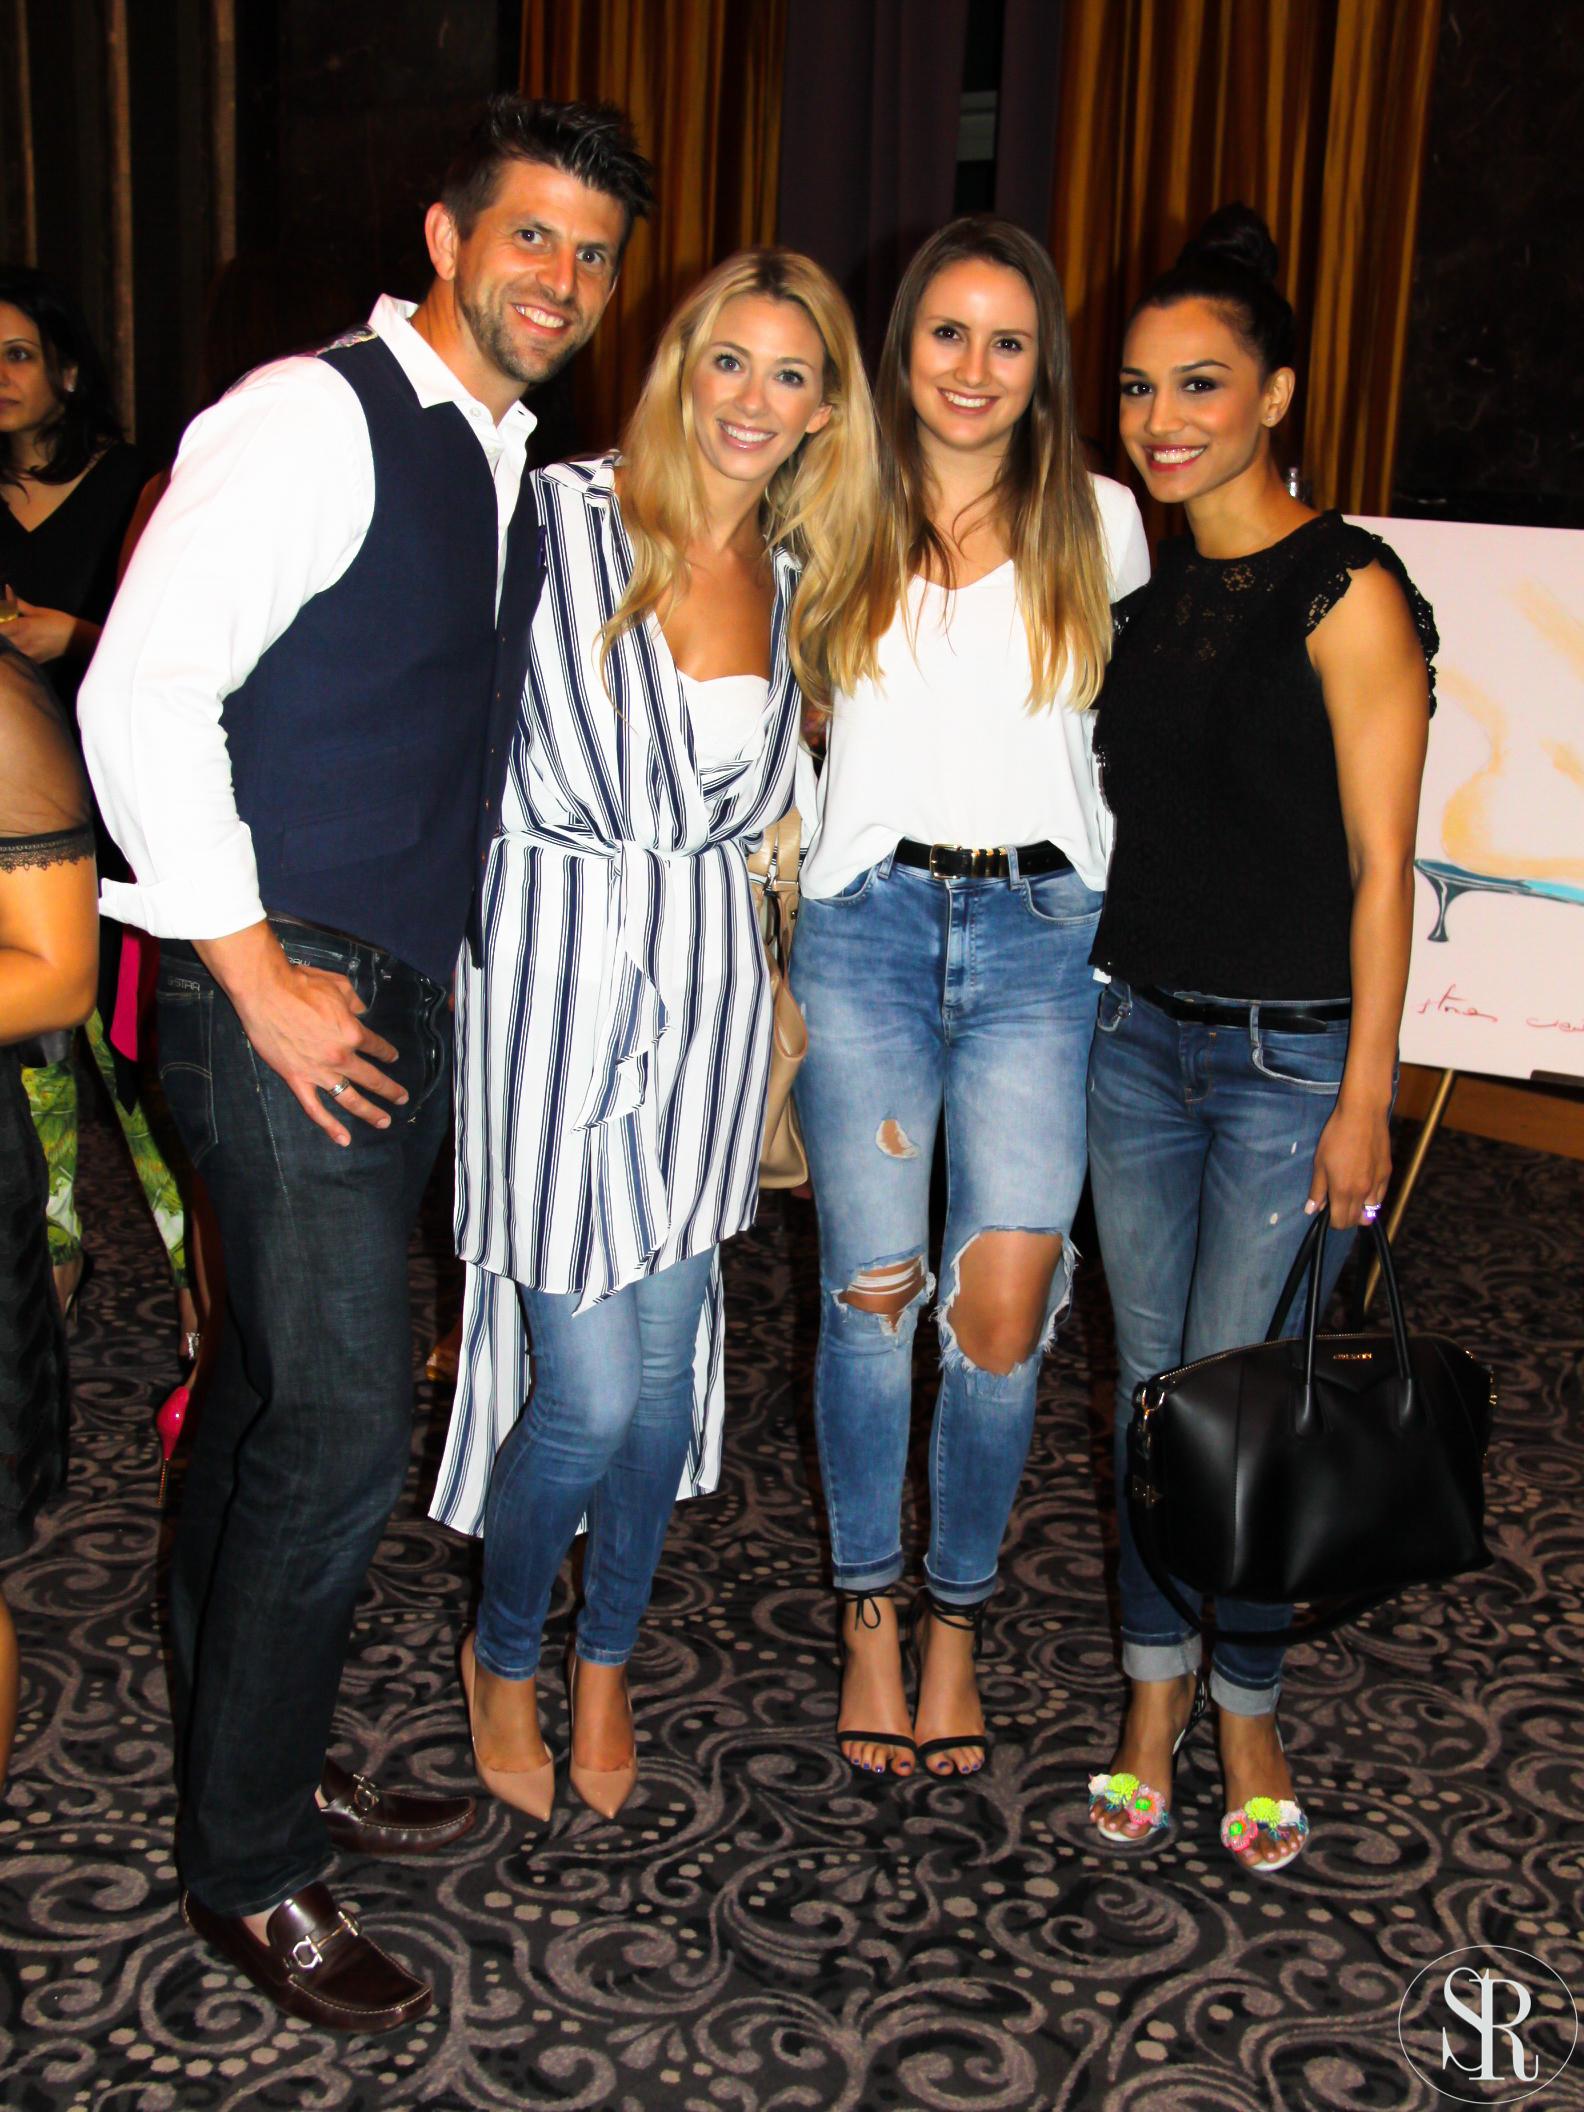 VIP launch of MANOLO BLAHNIK collection Fashion Afternoon Tea by Raffles Dubai-4063.jpg